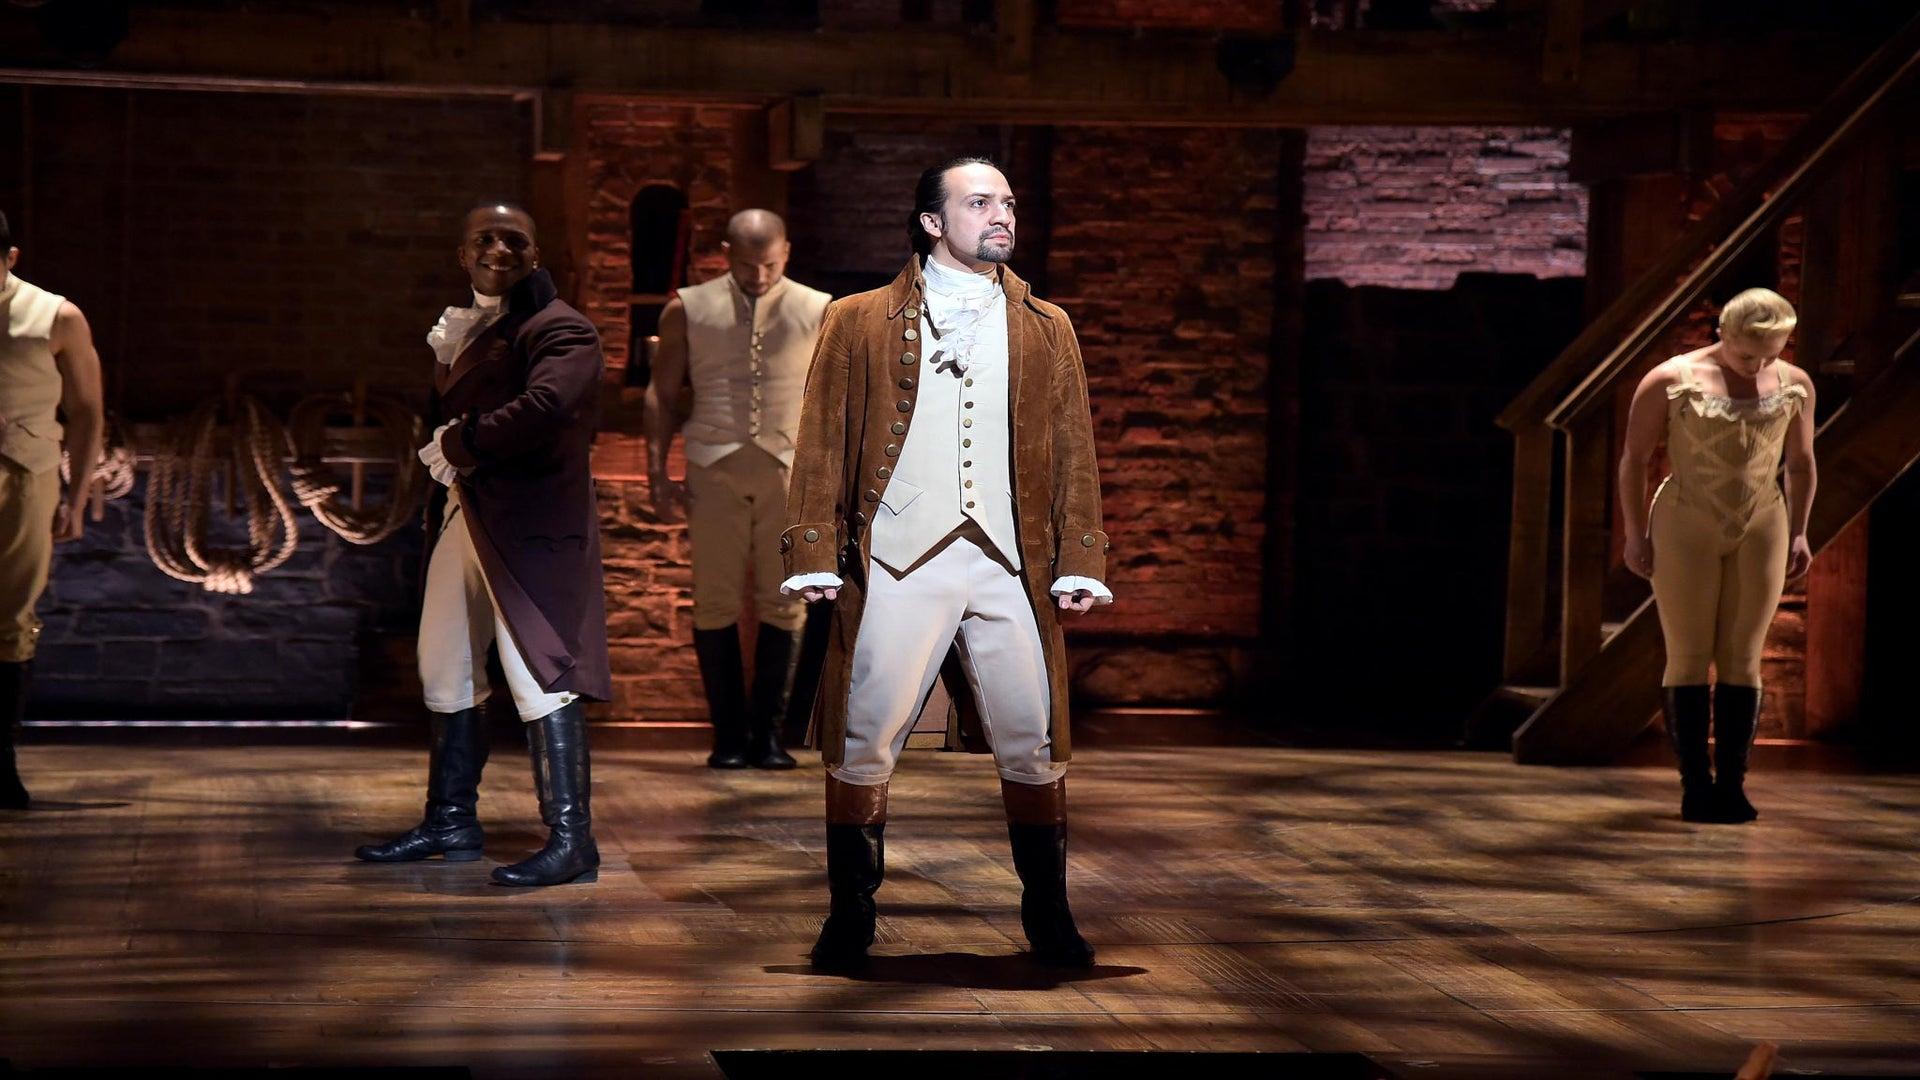 Broadway Phenom 'Hamilton' Nabs a 2016 Pulitzer Prize for Drama